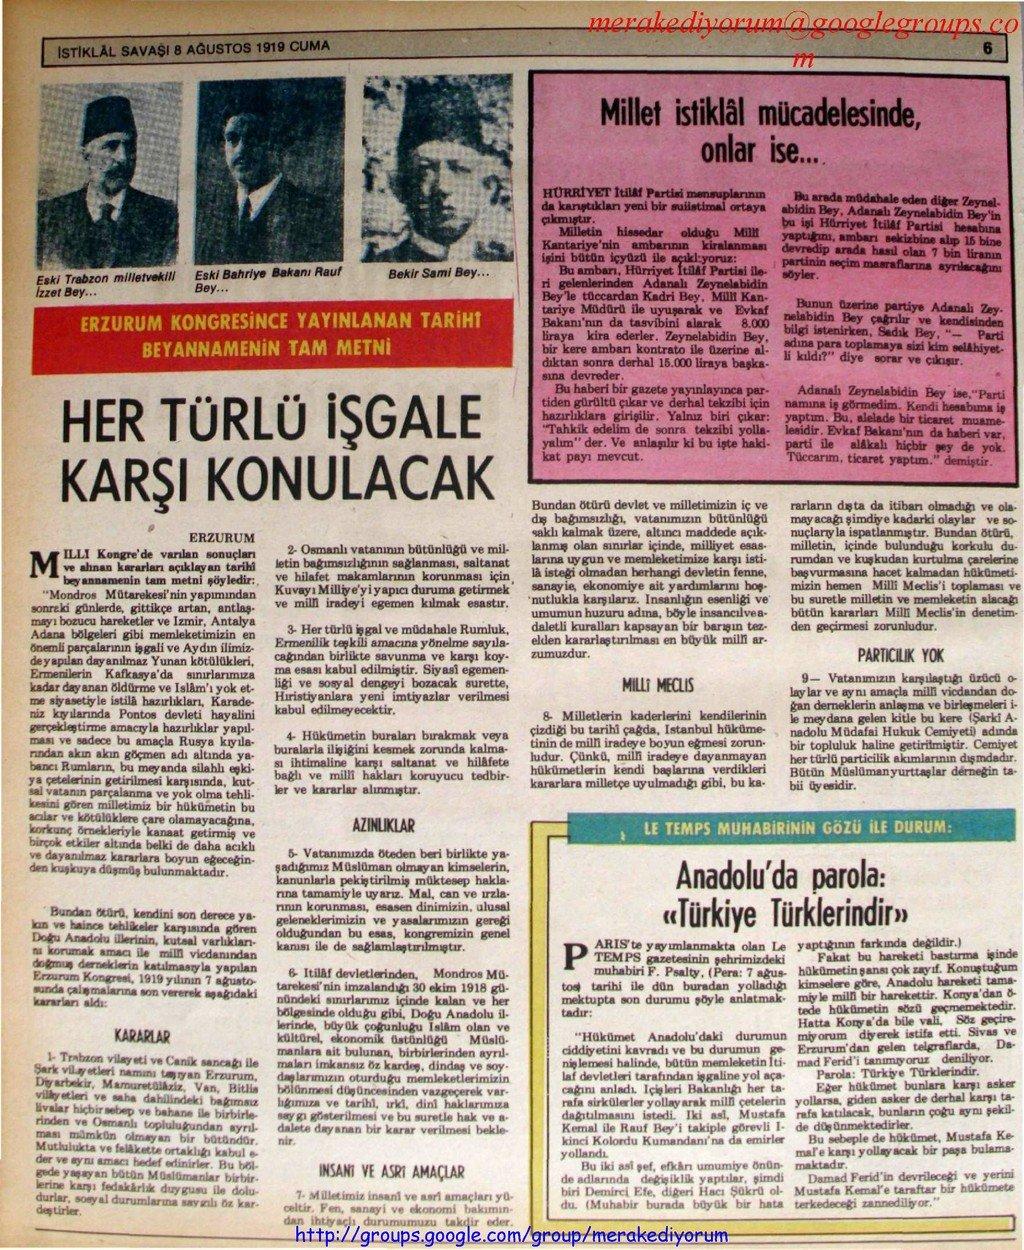 istiklal savaşı gazetesi - 7 ağustos 1919